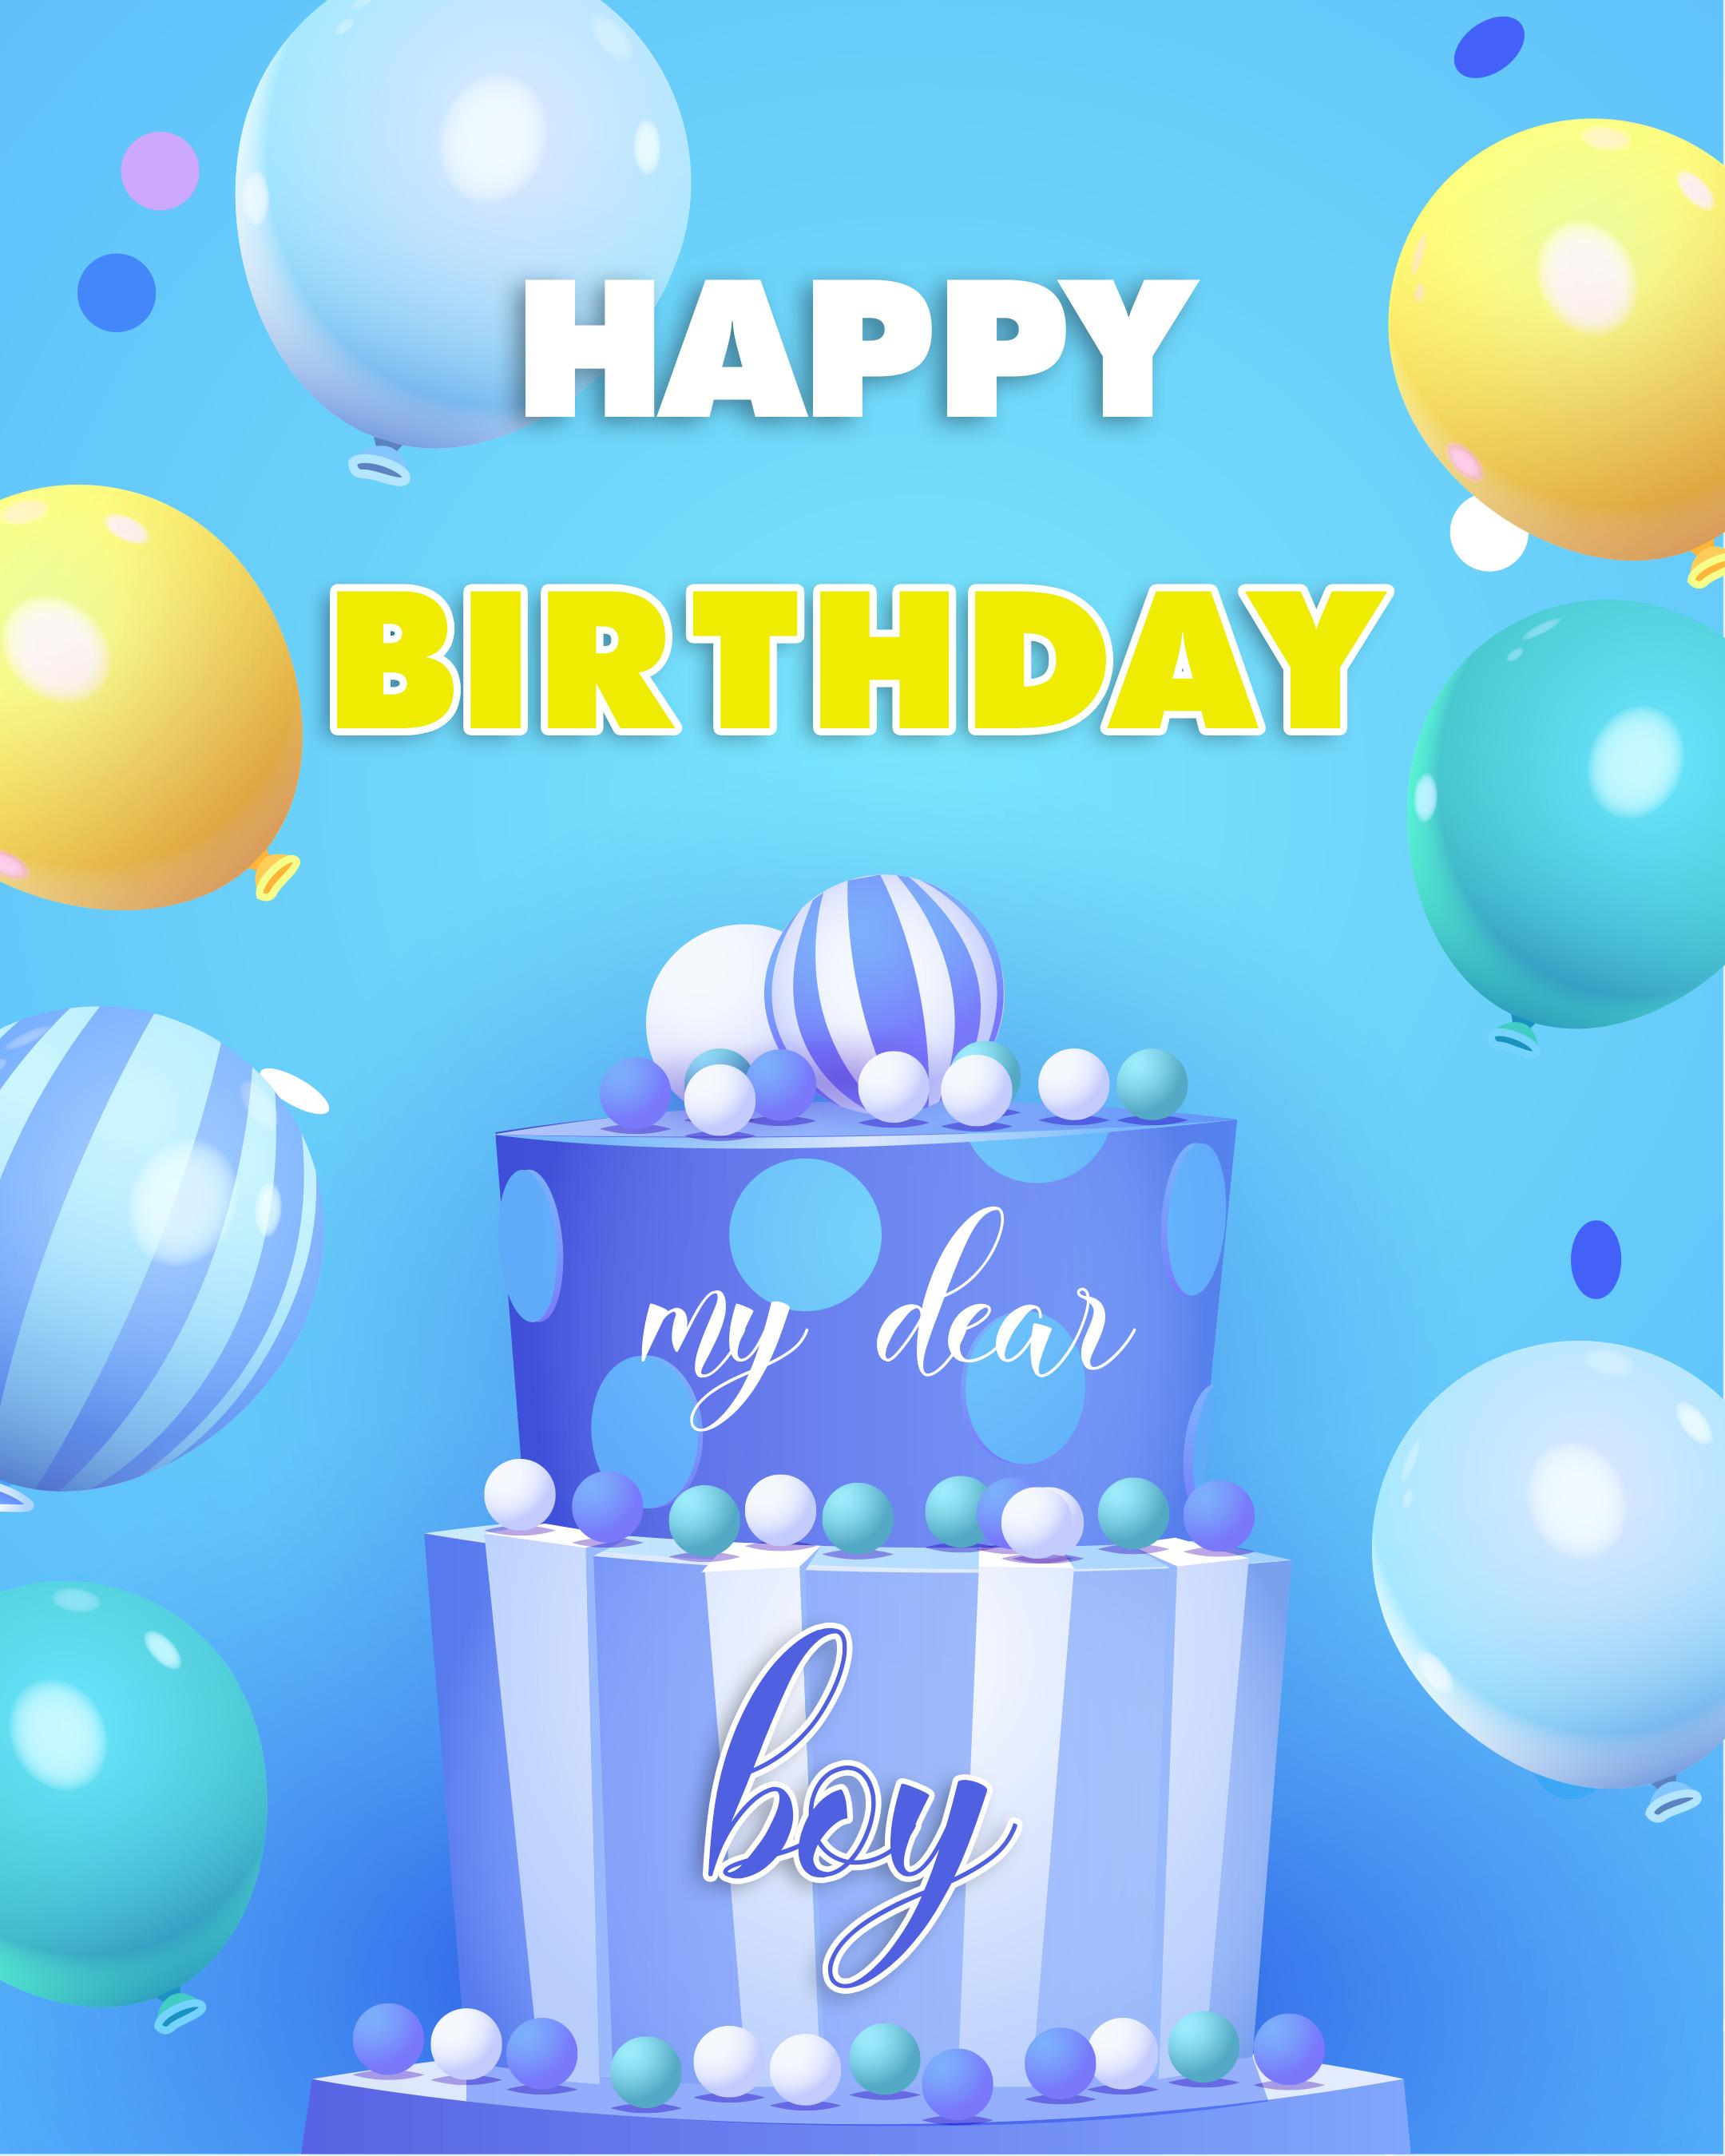 Free Happy Birthday Image For Boy With Cake - birthdayimg.com